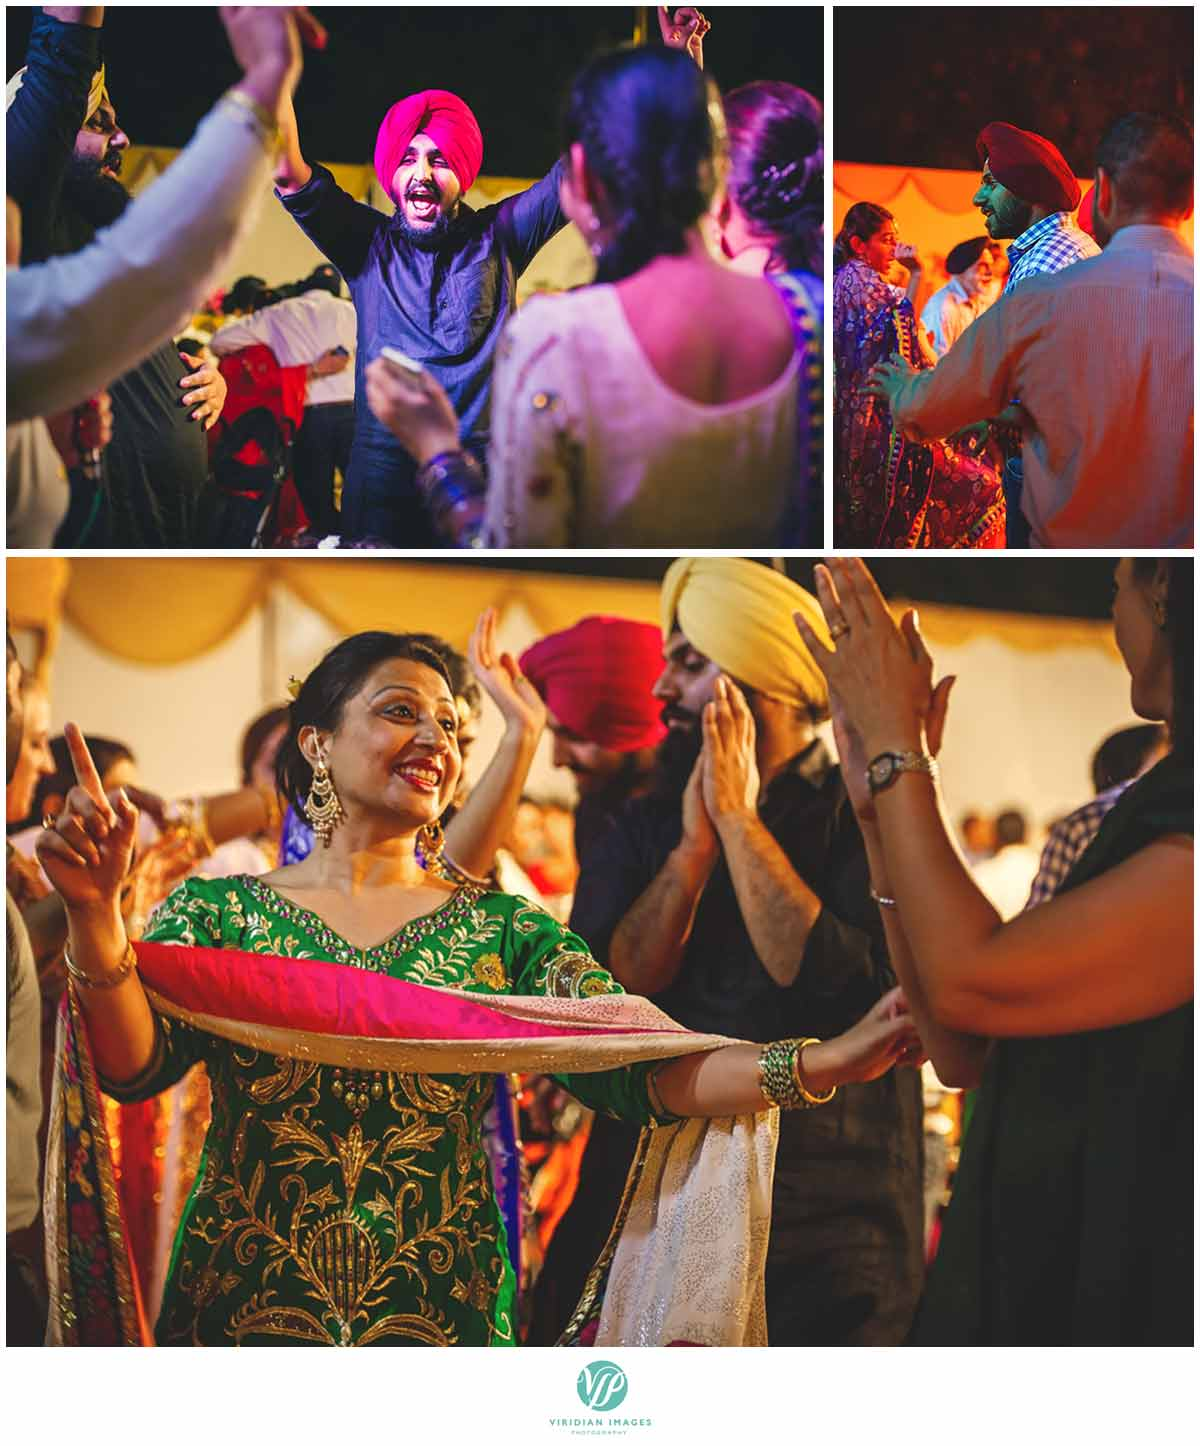 India_Chandigarh_Sangeet_Viridian_Images_Photography_poto_5.1